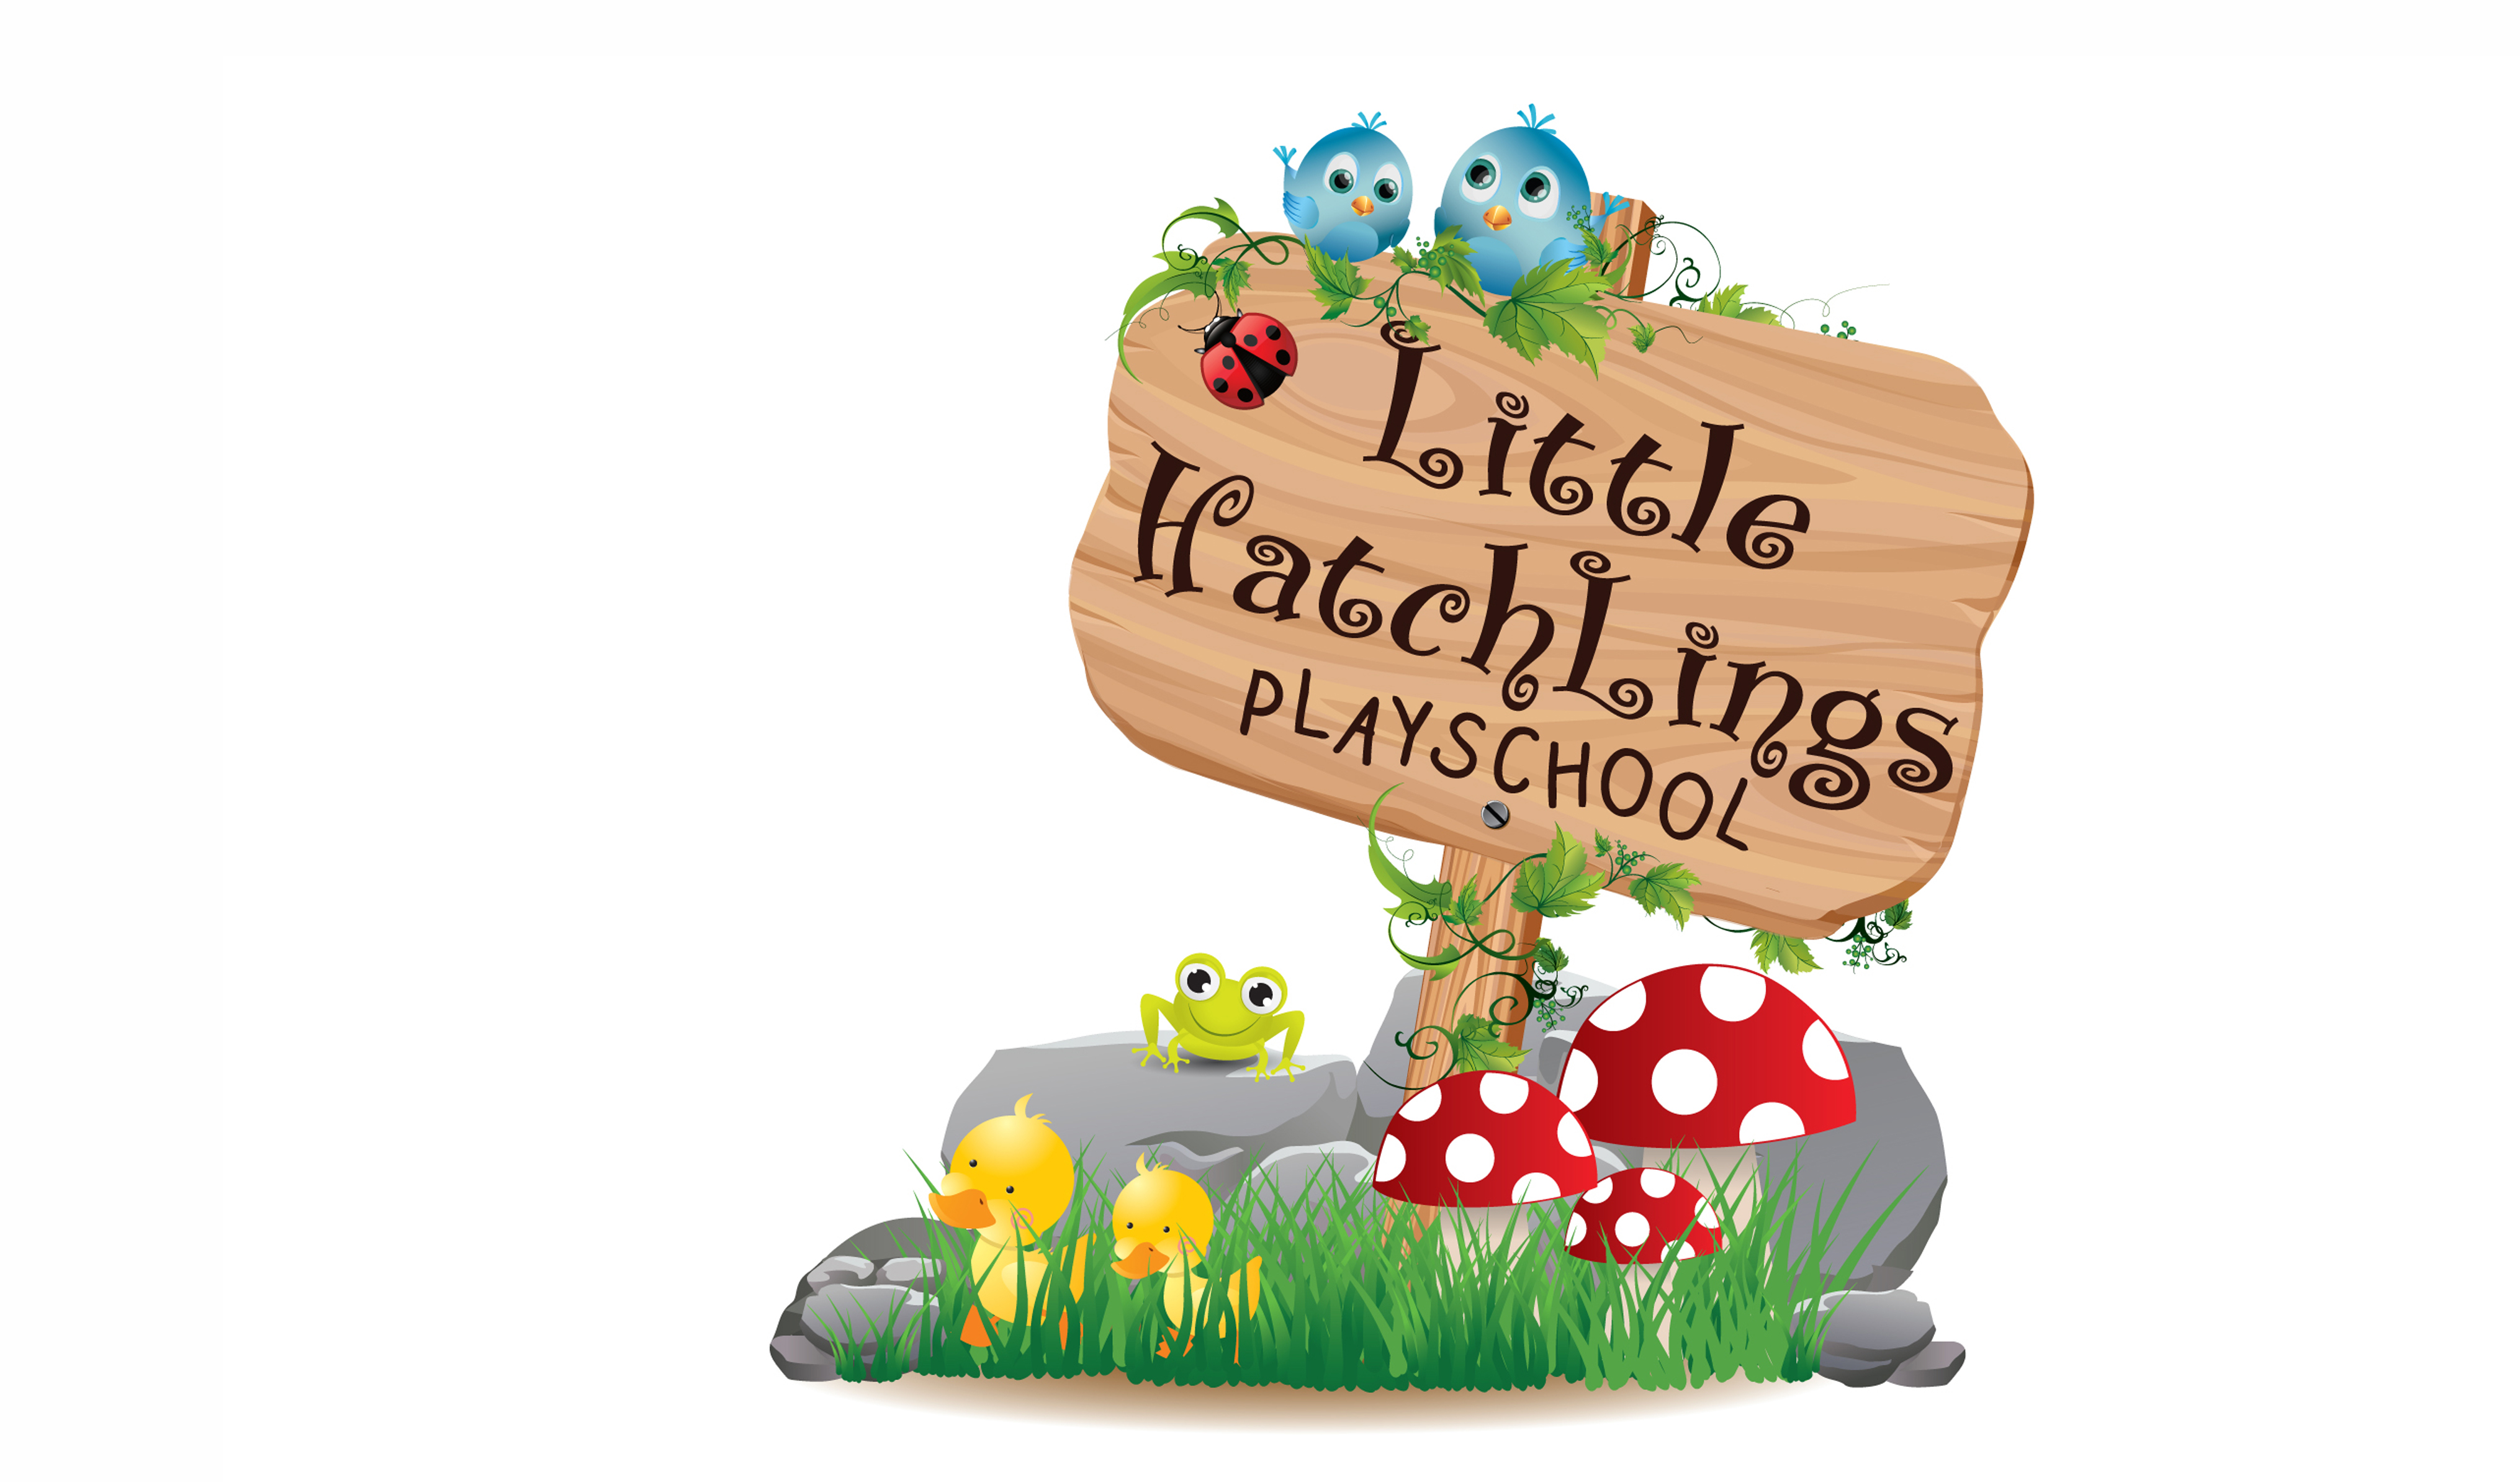 Little Hatchlings Playschool